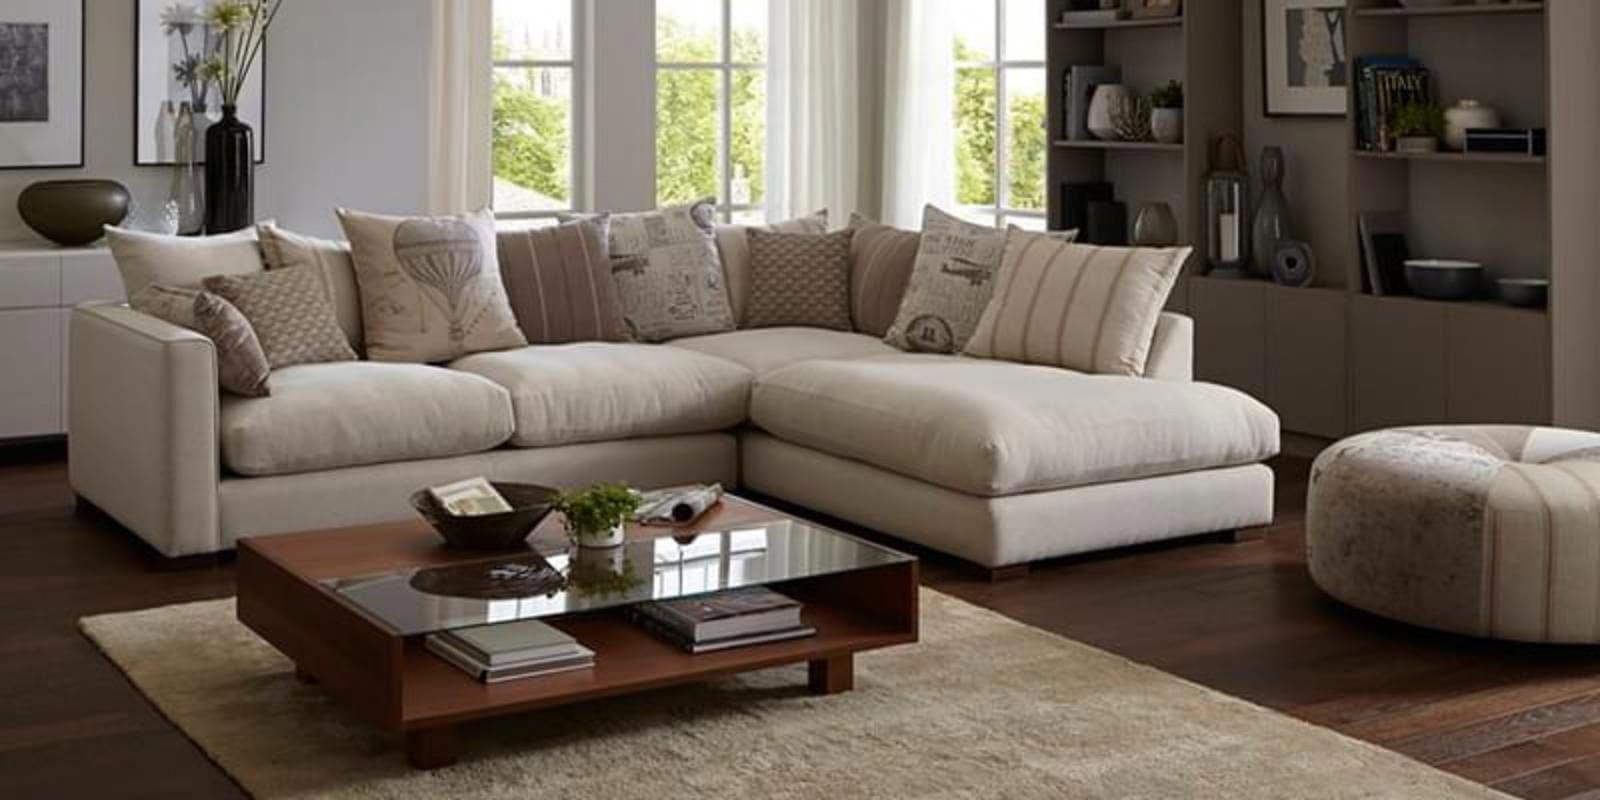 Small Living Room L Shape Sofa in 2020 | Sofa set designs ...